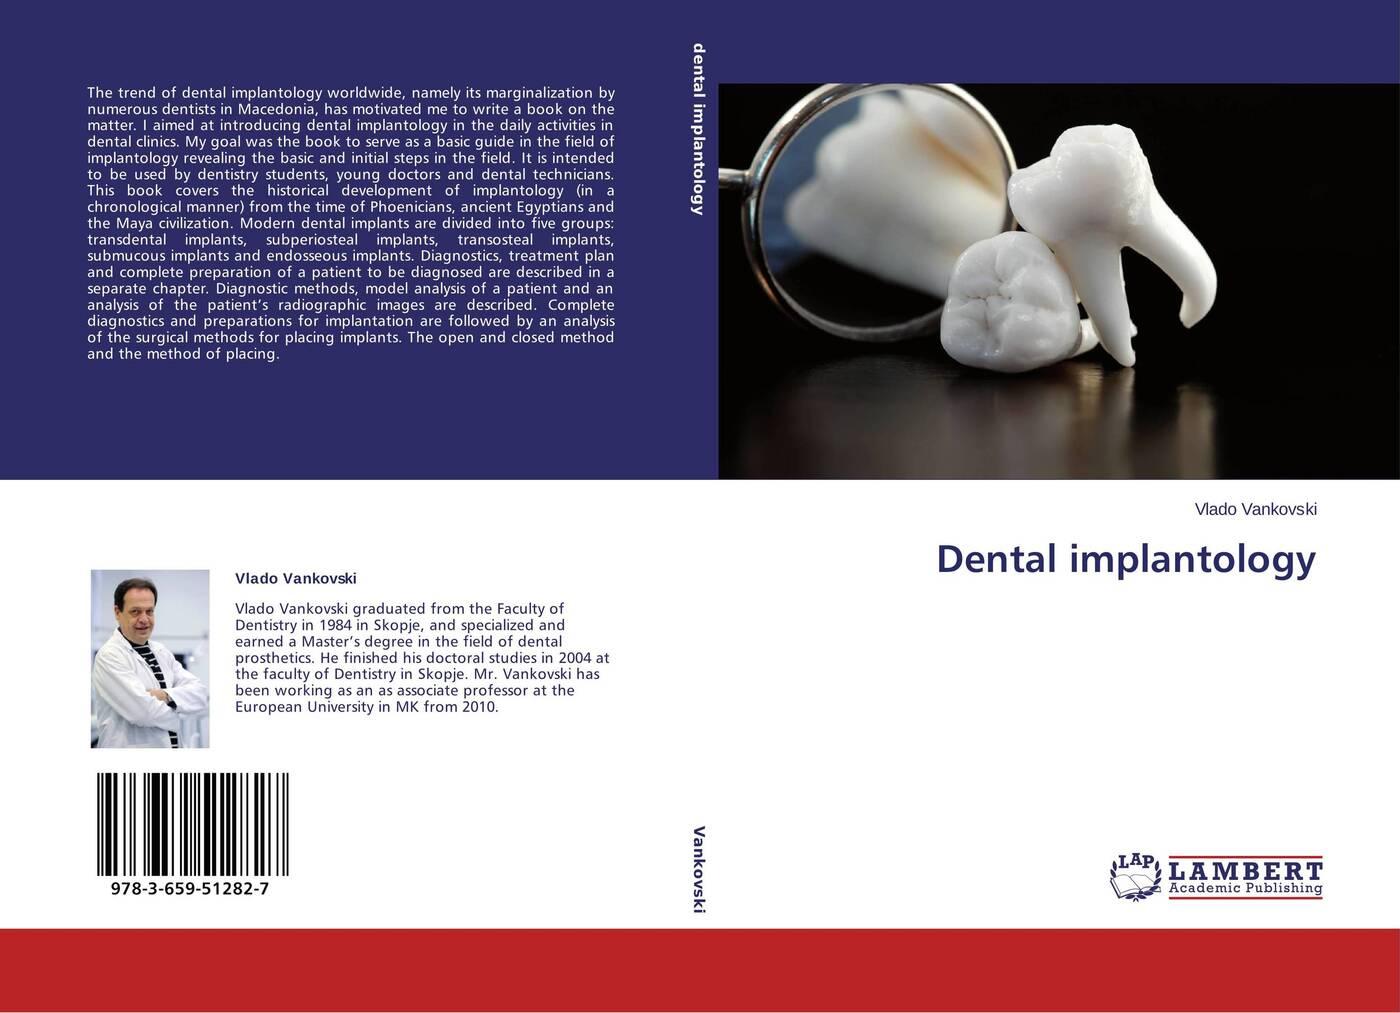 Vlado Vankovski Dental implantology 1x angular 30 degree one piece multi unit abutment for internal hex dental implants bio effect top quality